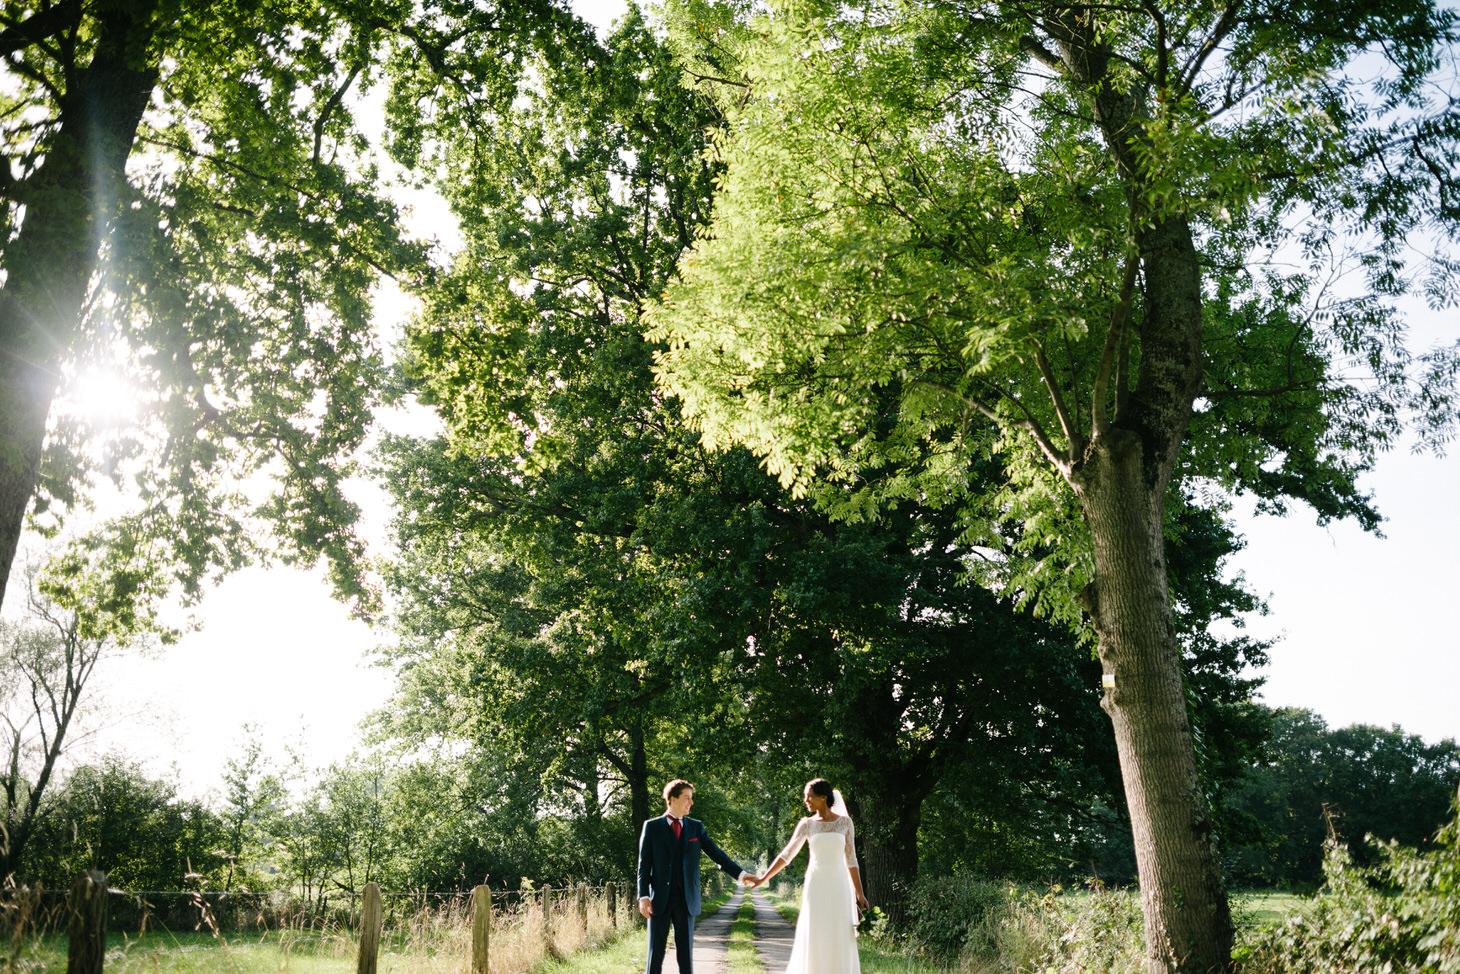 photographe-mariage-lyon-0490